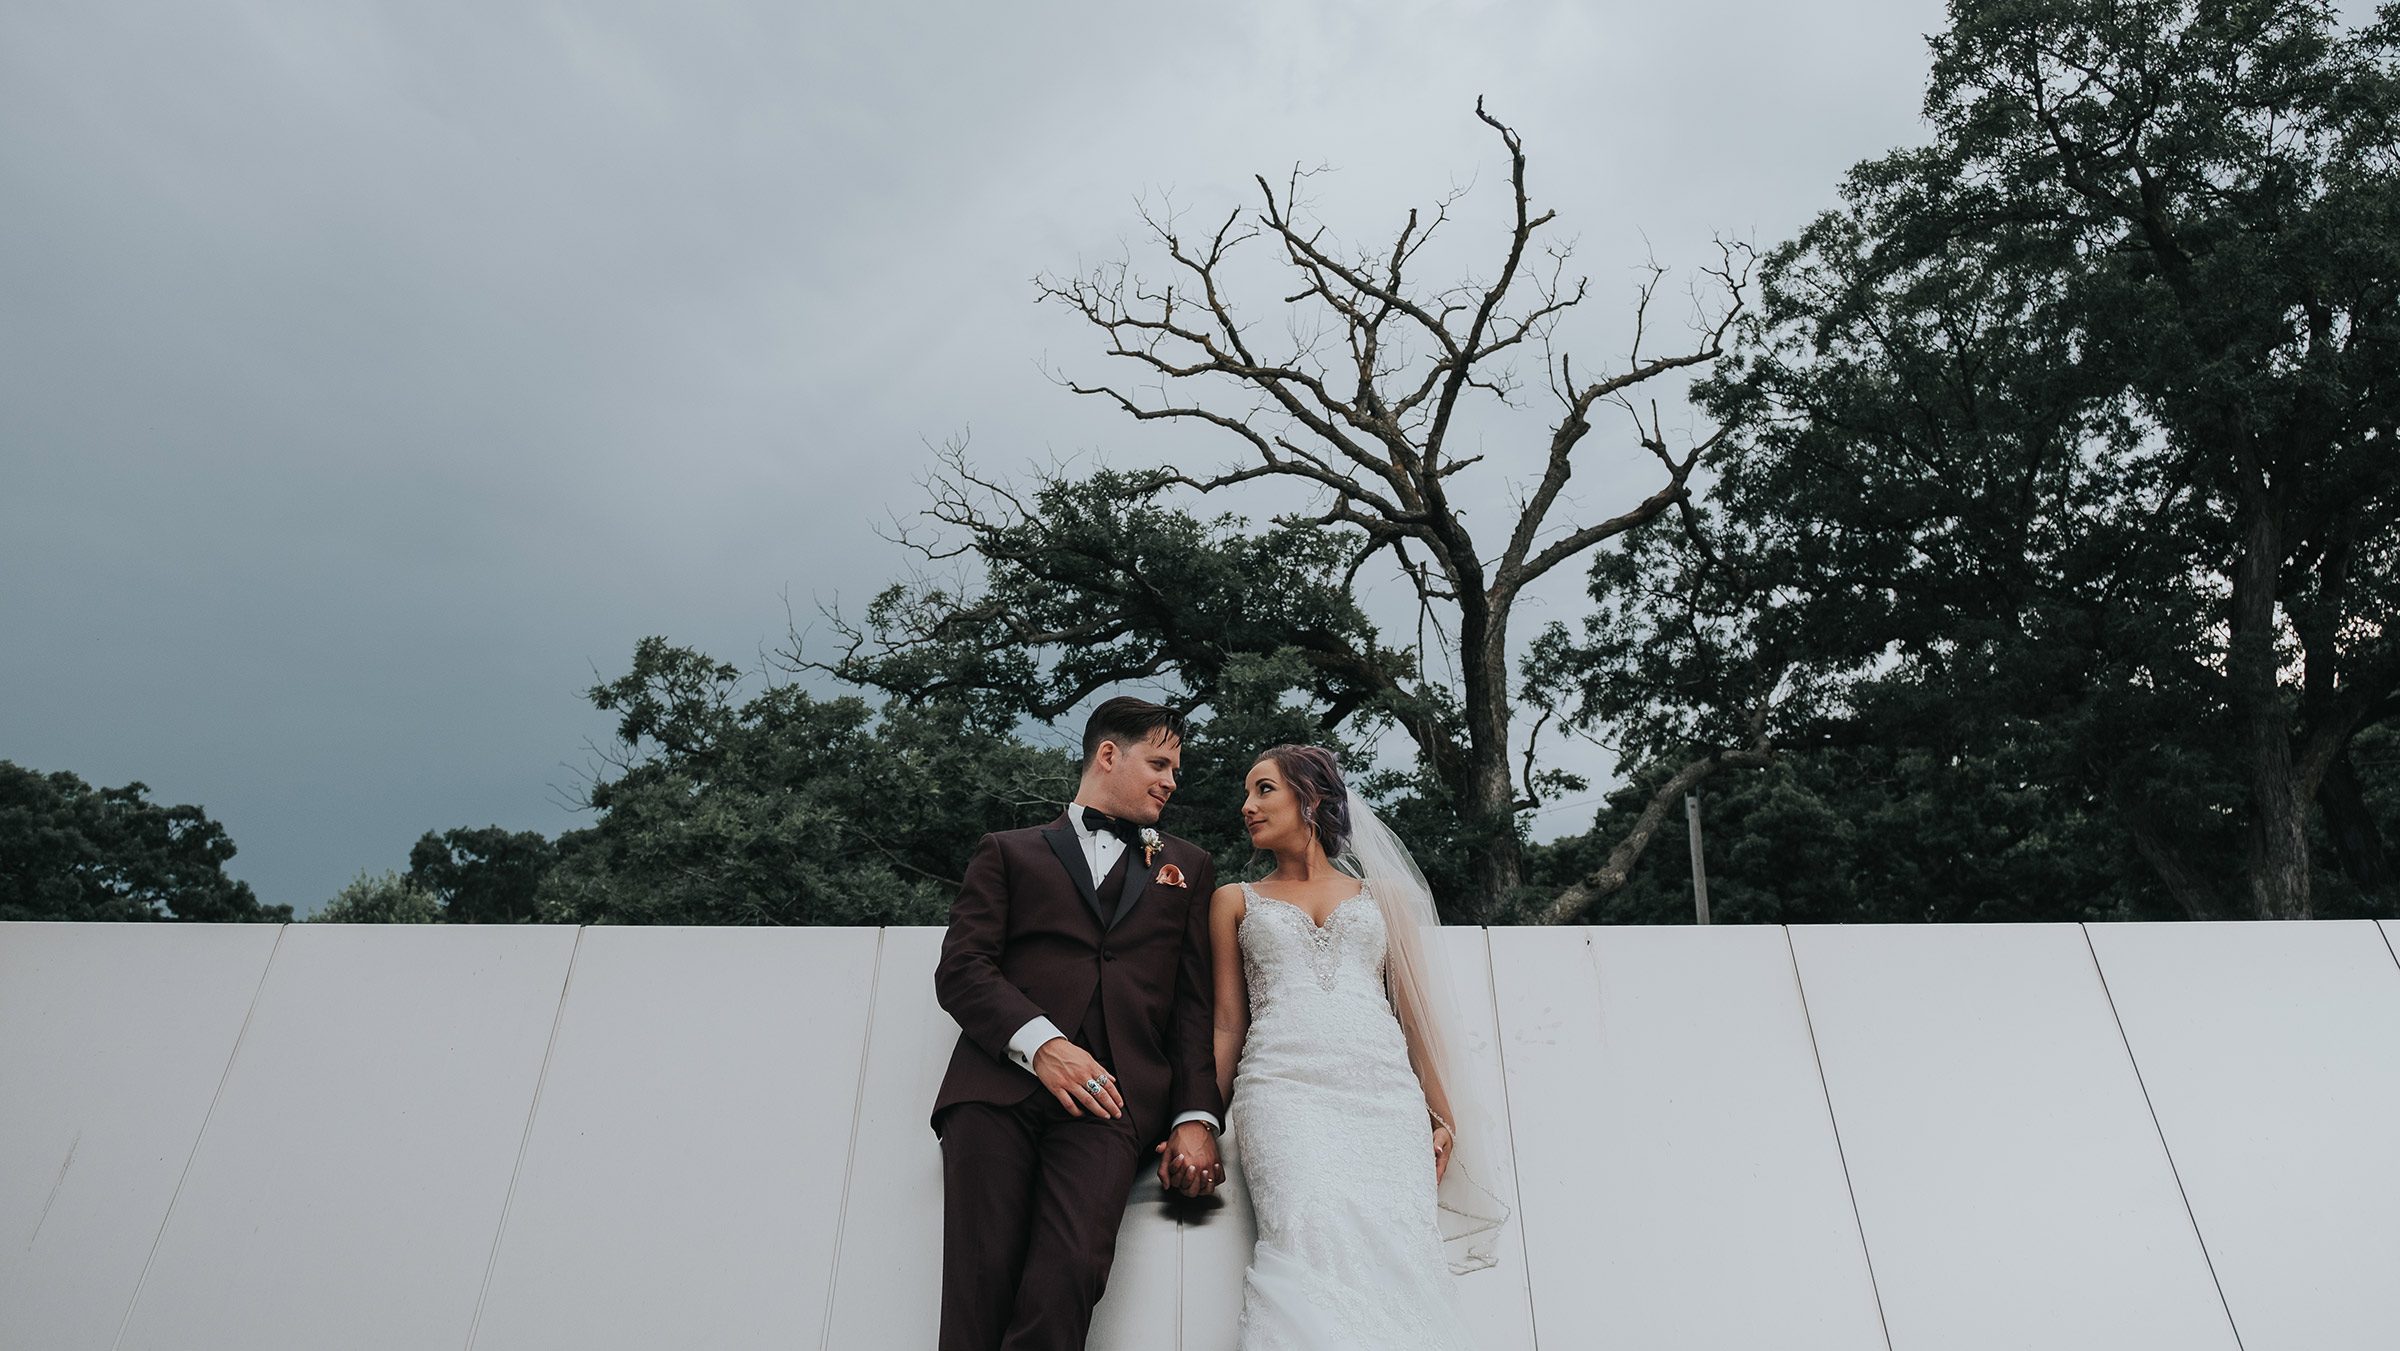 bride-groom-leaning-against-building-desmoines-iowa-art-center-raelyn-ramey-photography.jpg